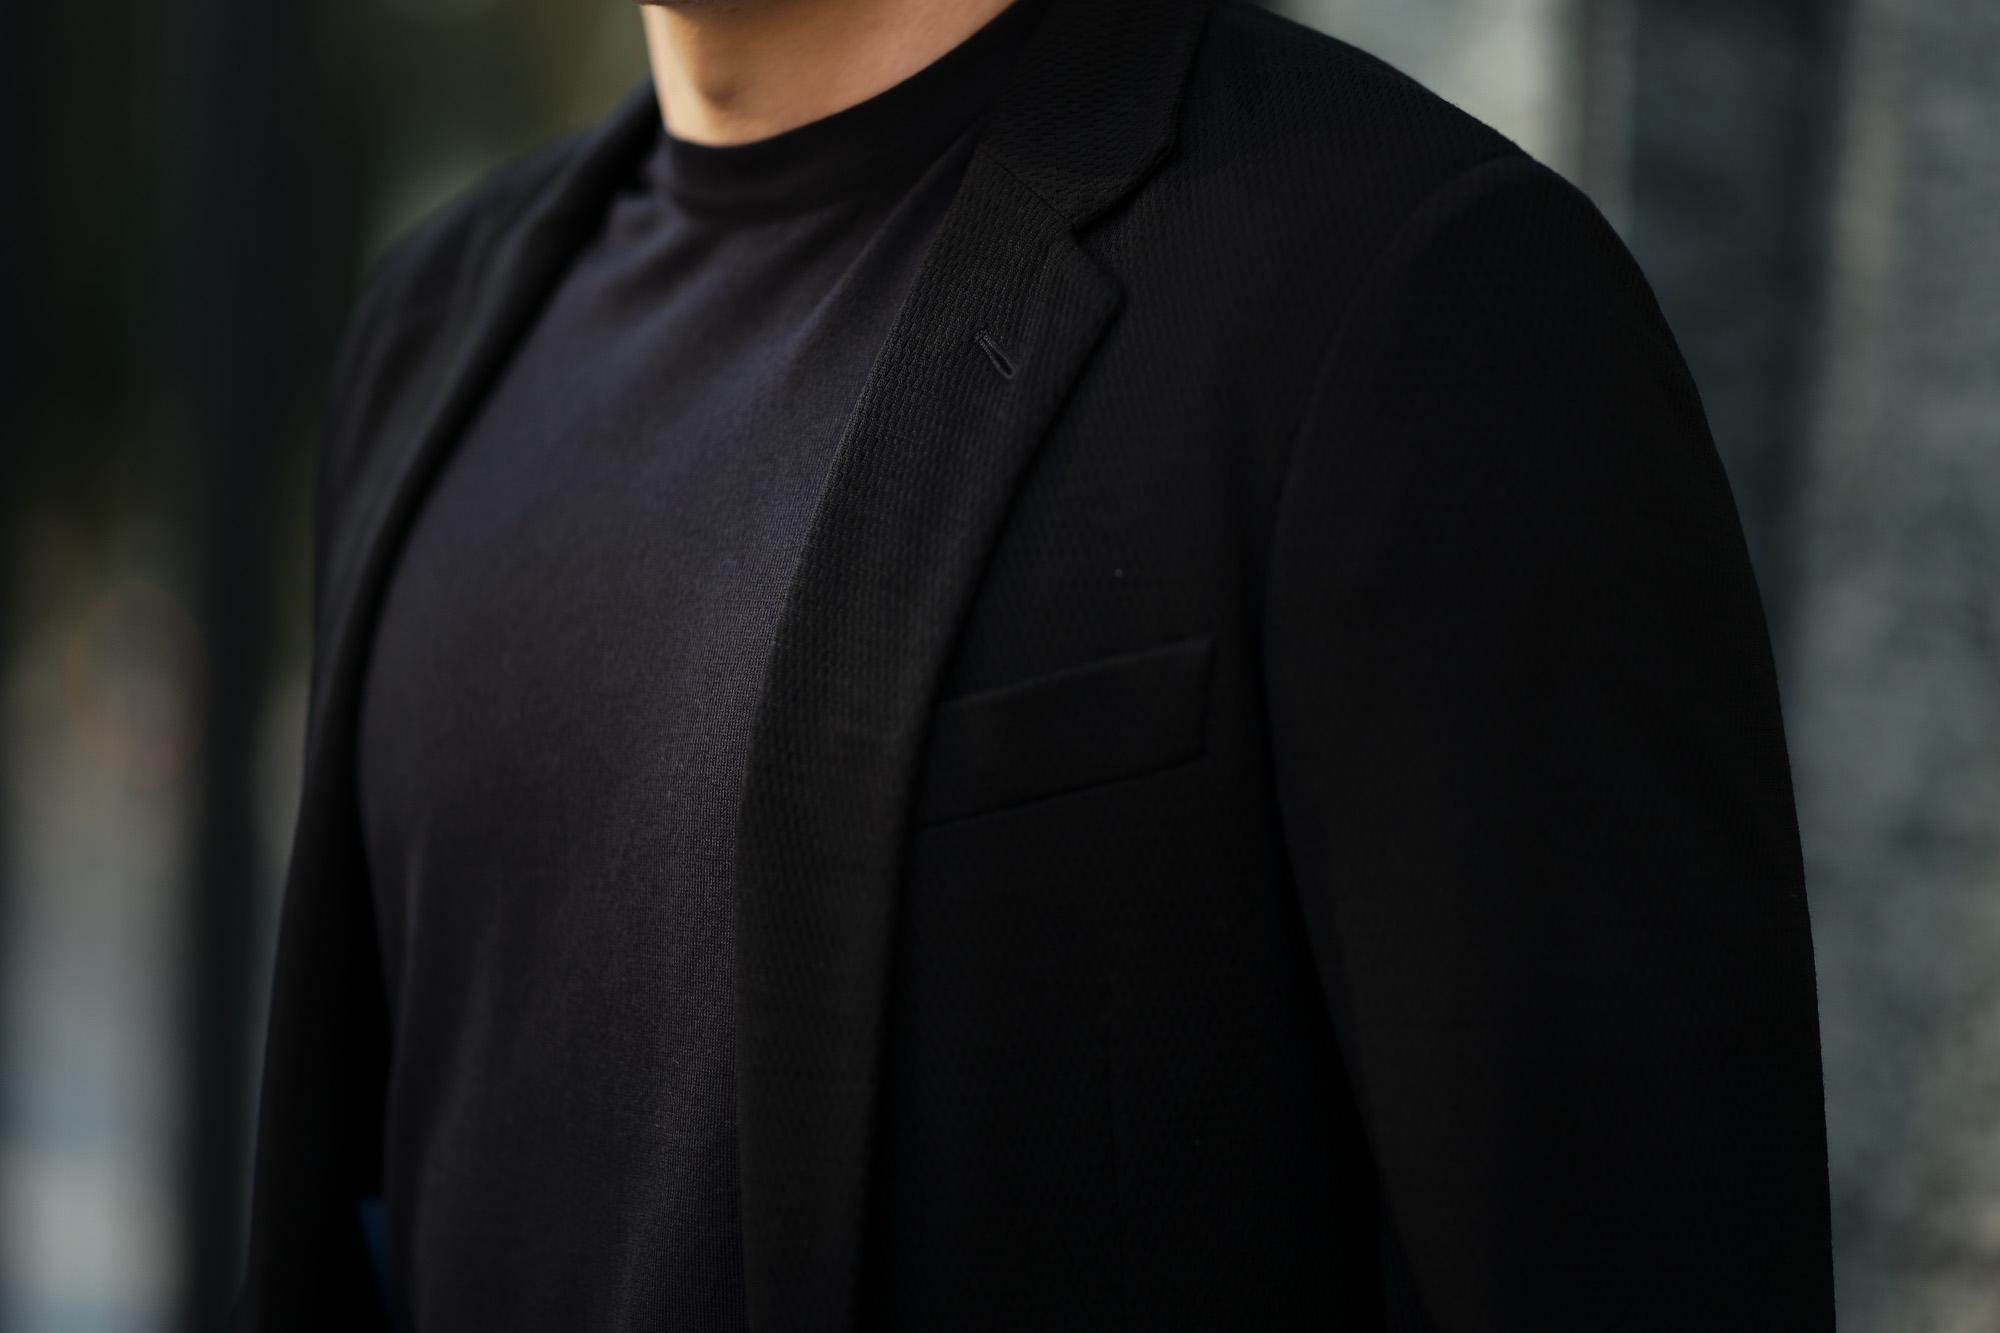 BELVEST (ベルベスト) CAPSULE SINGLE BREASTE JACKET 2PATCH WITH BAG SUPER120's Jersey パッカブル サマーウールジャージ ジャケット BLACK (ブラック) Made in italy (イタリア製) 2020 春夏新作  愛知 名古屋 altoediritto アルトエデリット